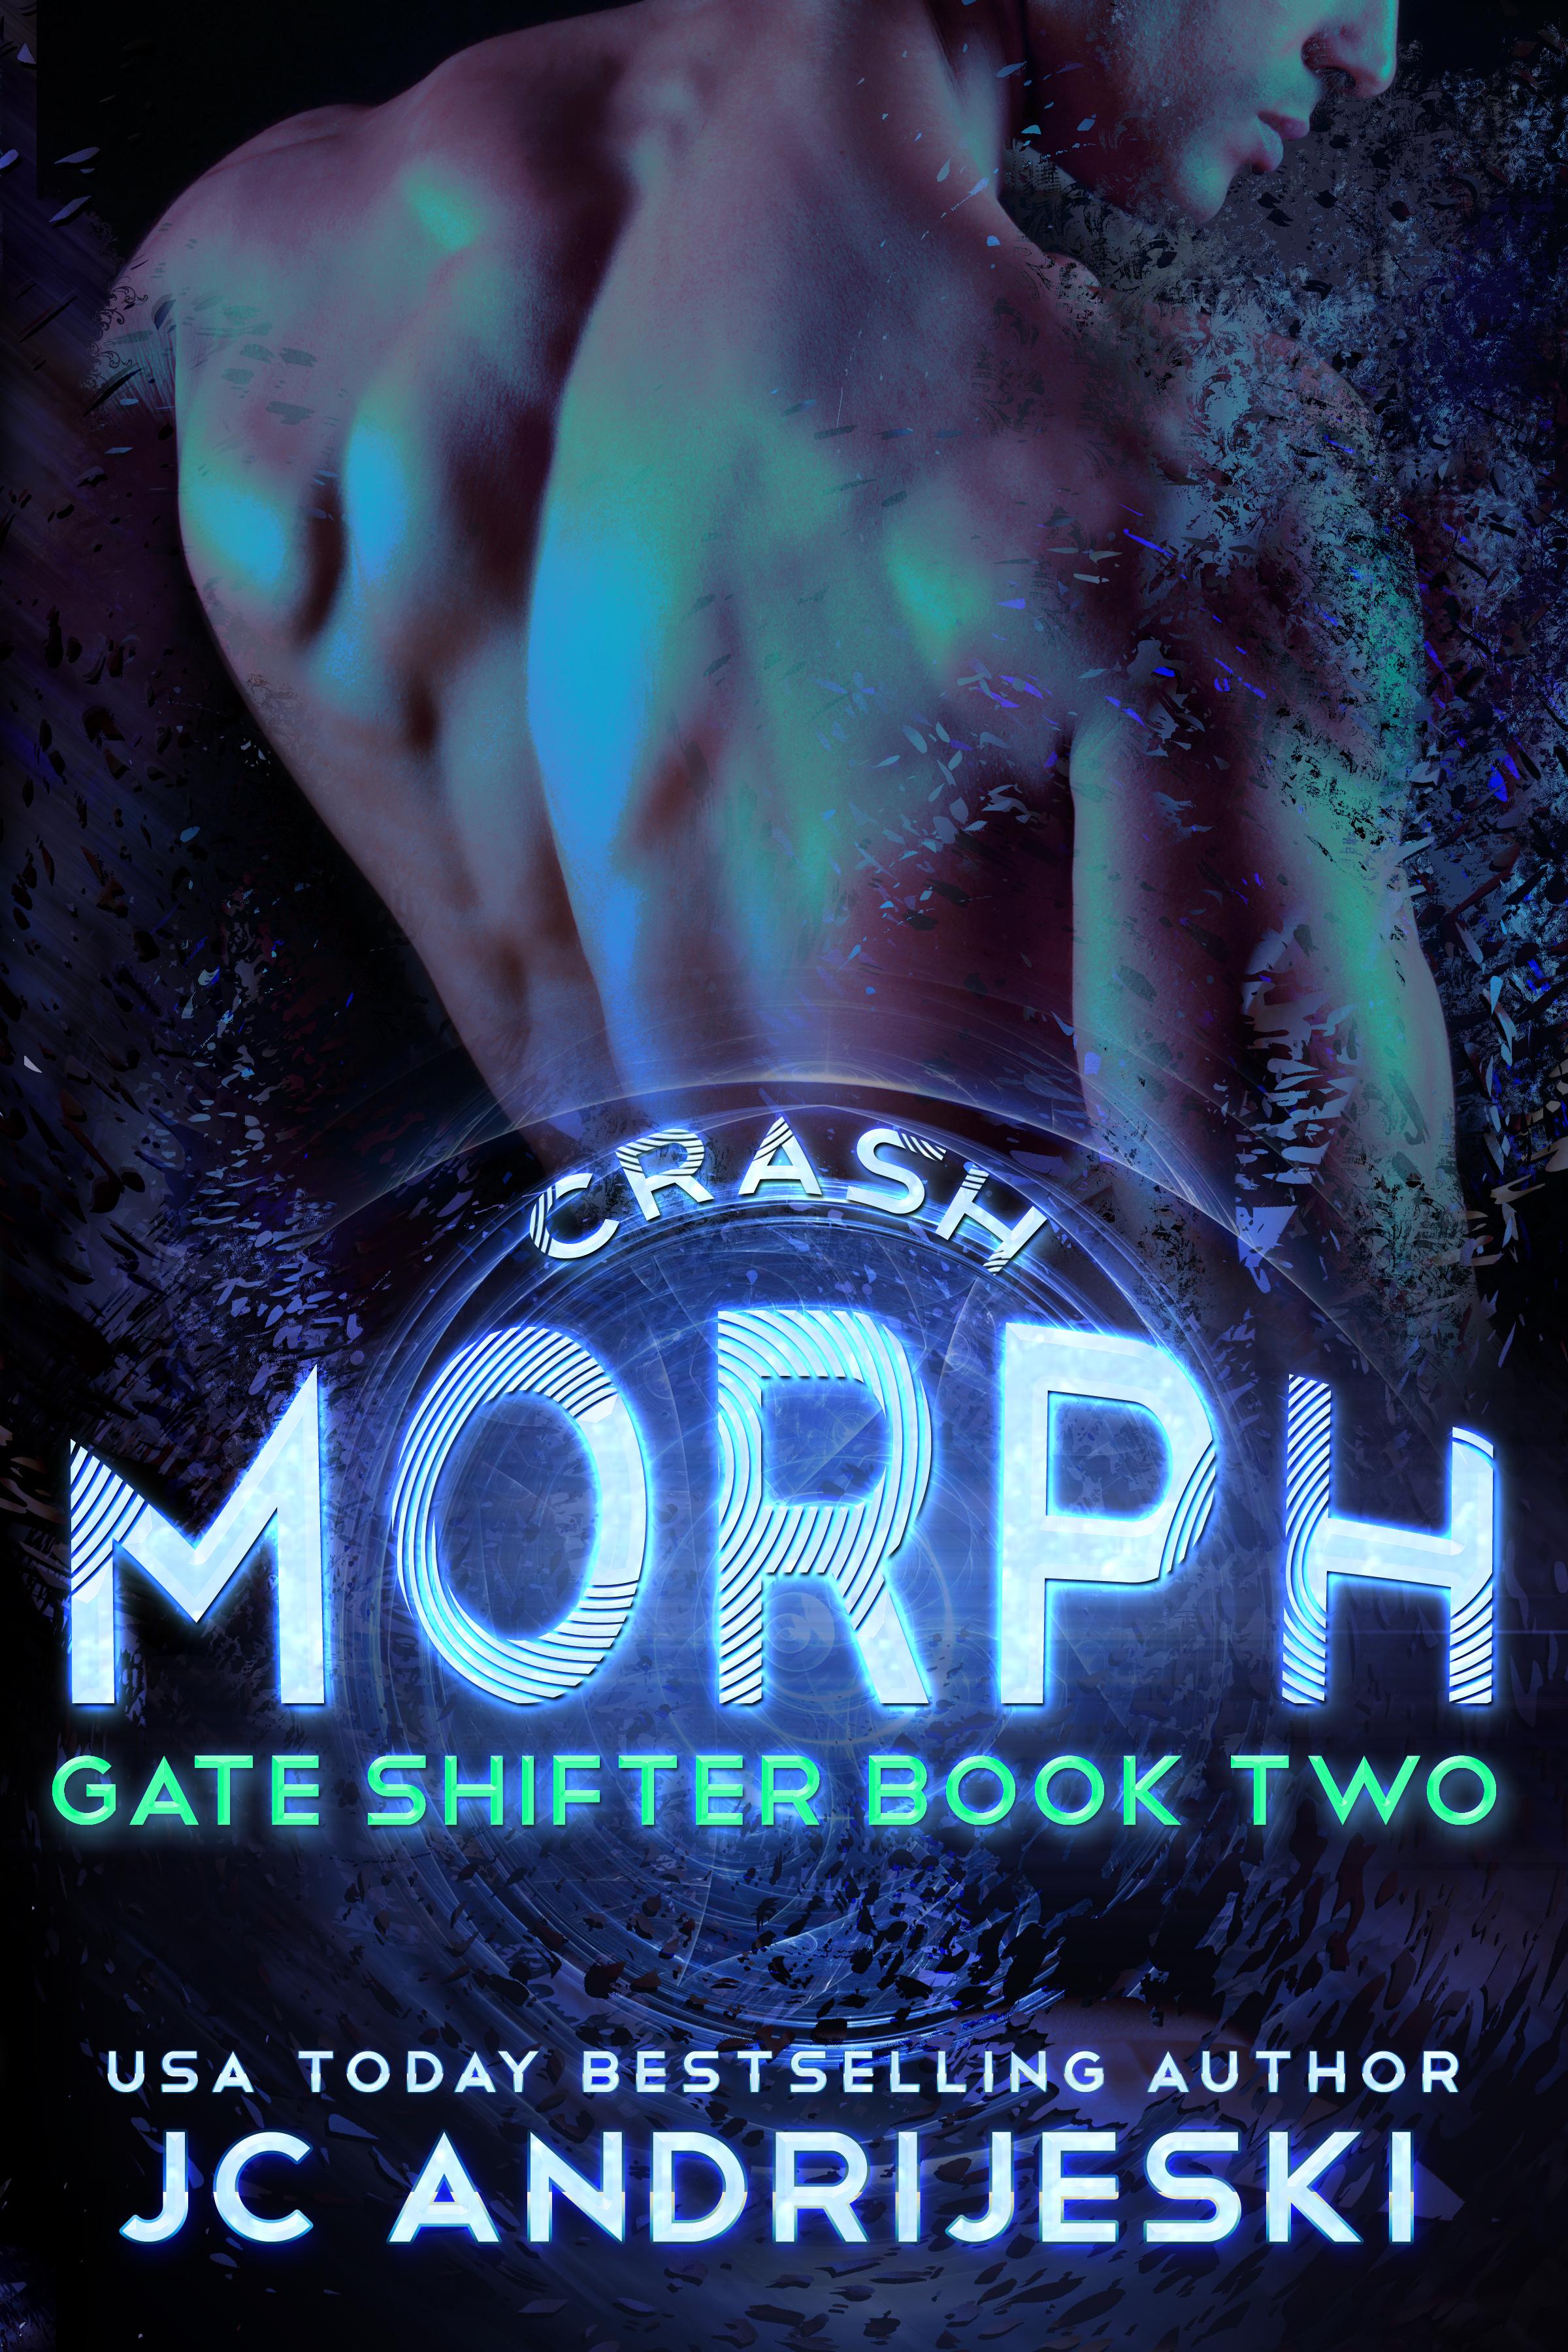 CRASH MORPH